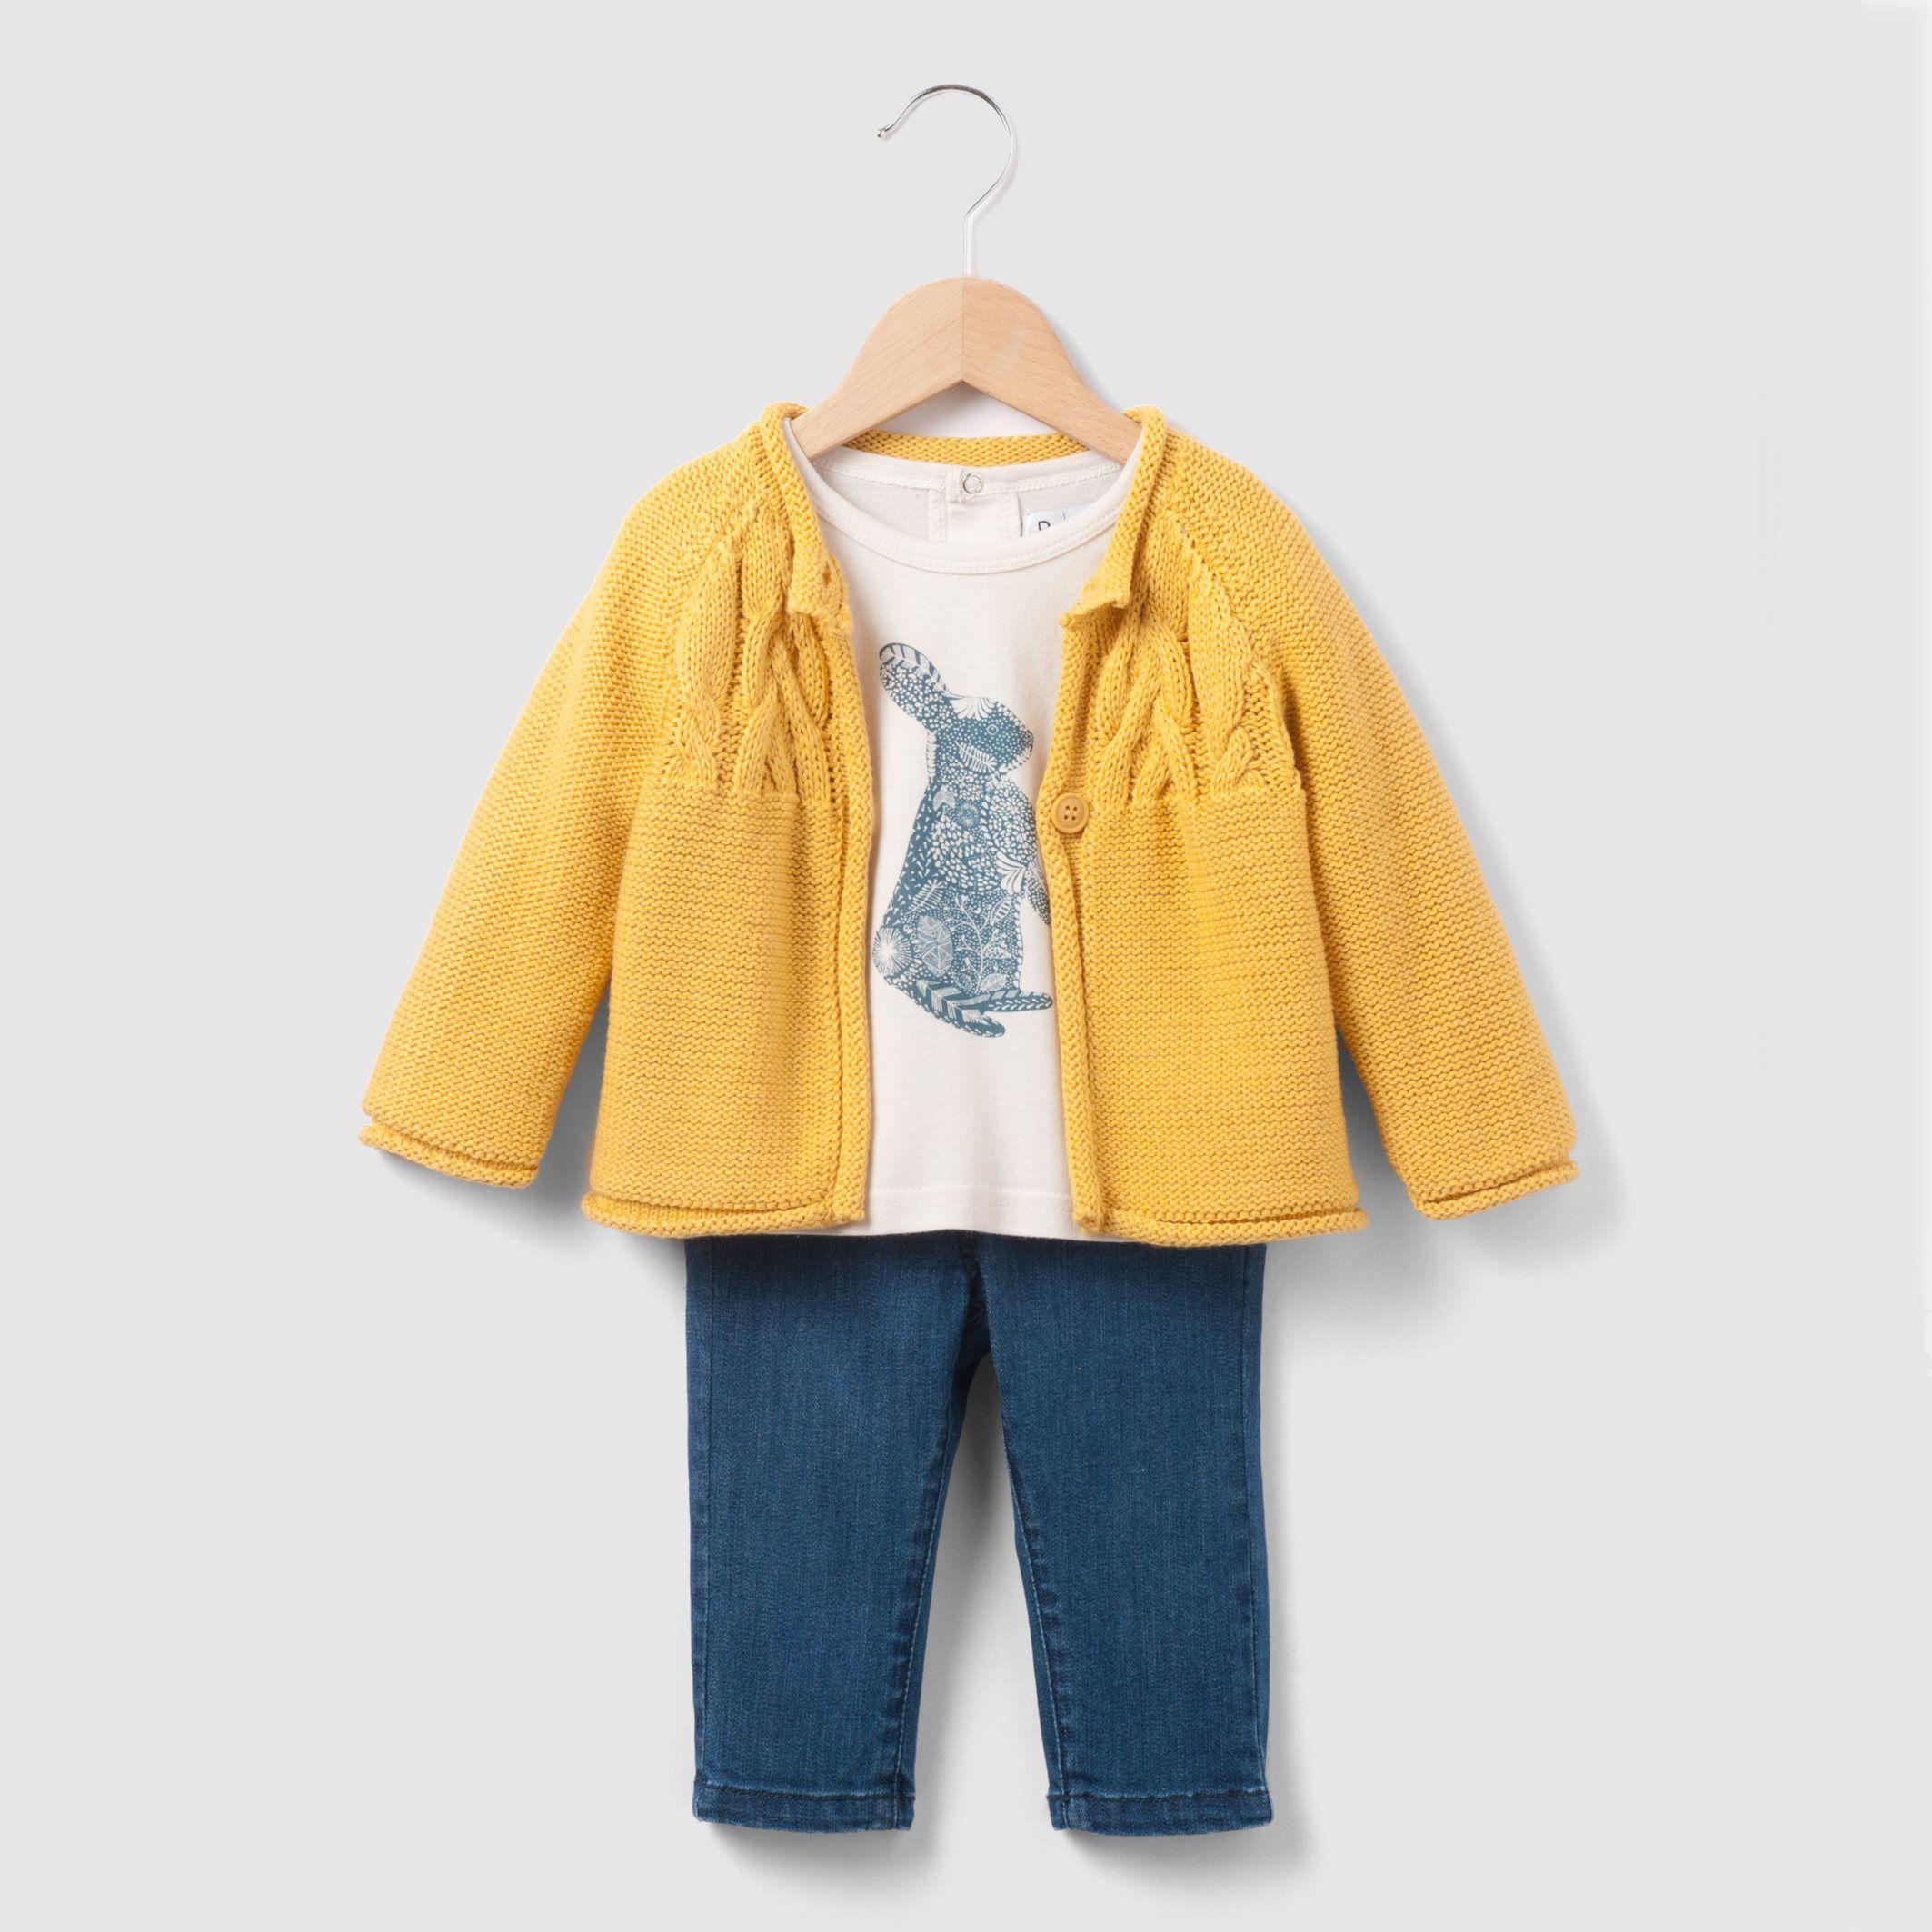 3-teiliges Set aus Strickjacke, Shirt und Jeans #Babymode #Jacke #Hose #Shirt